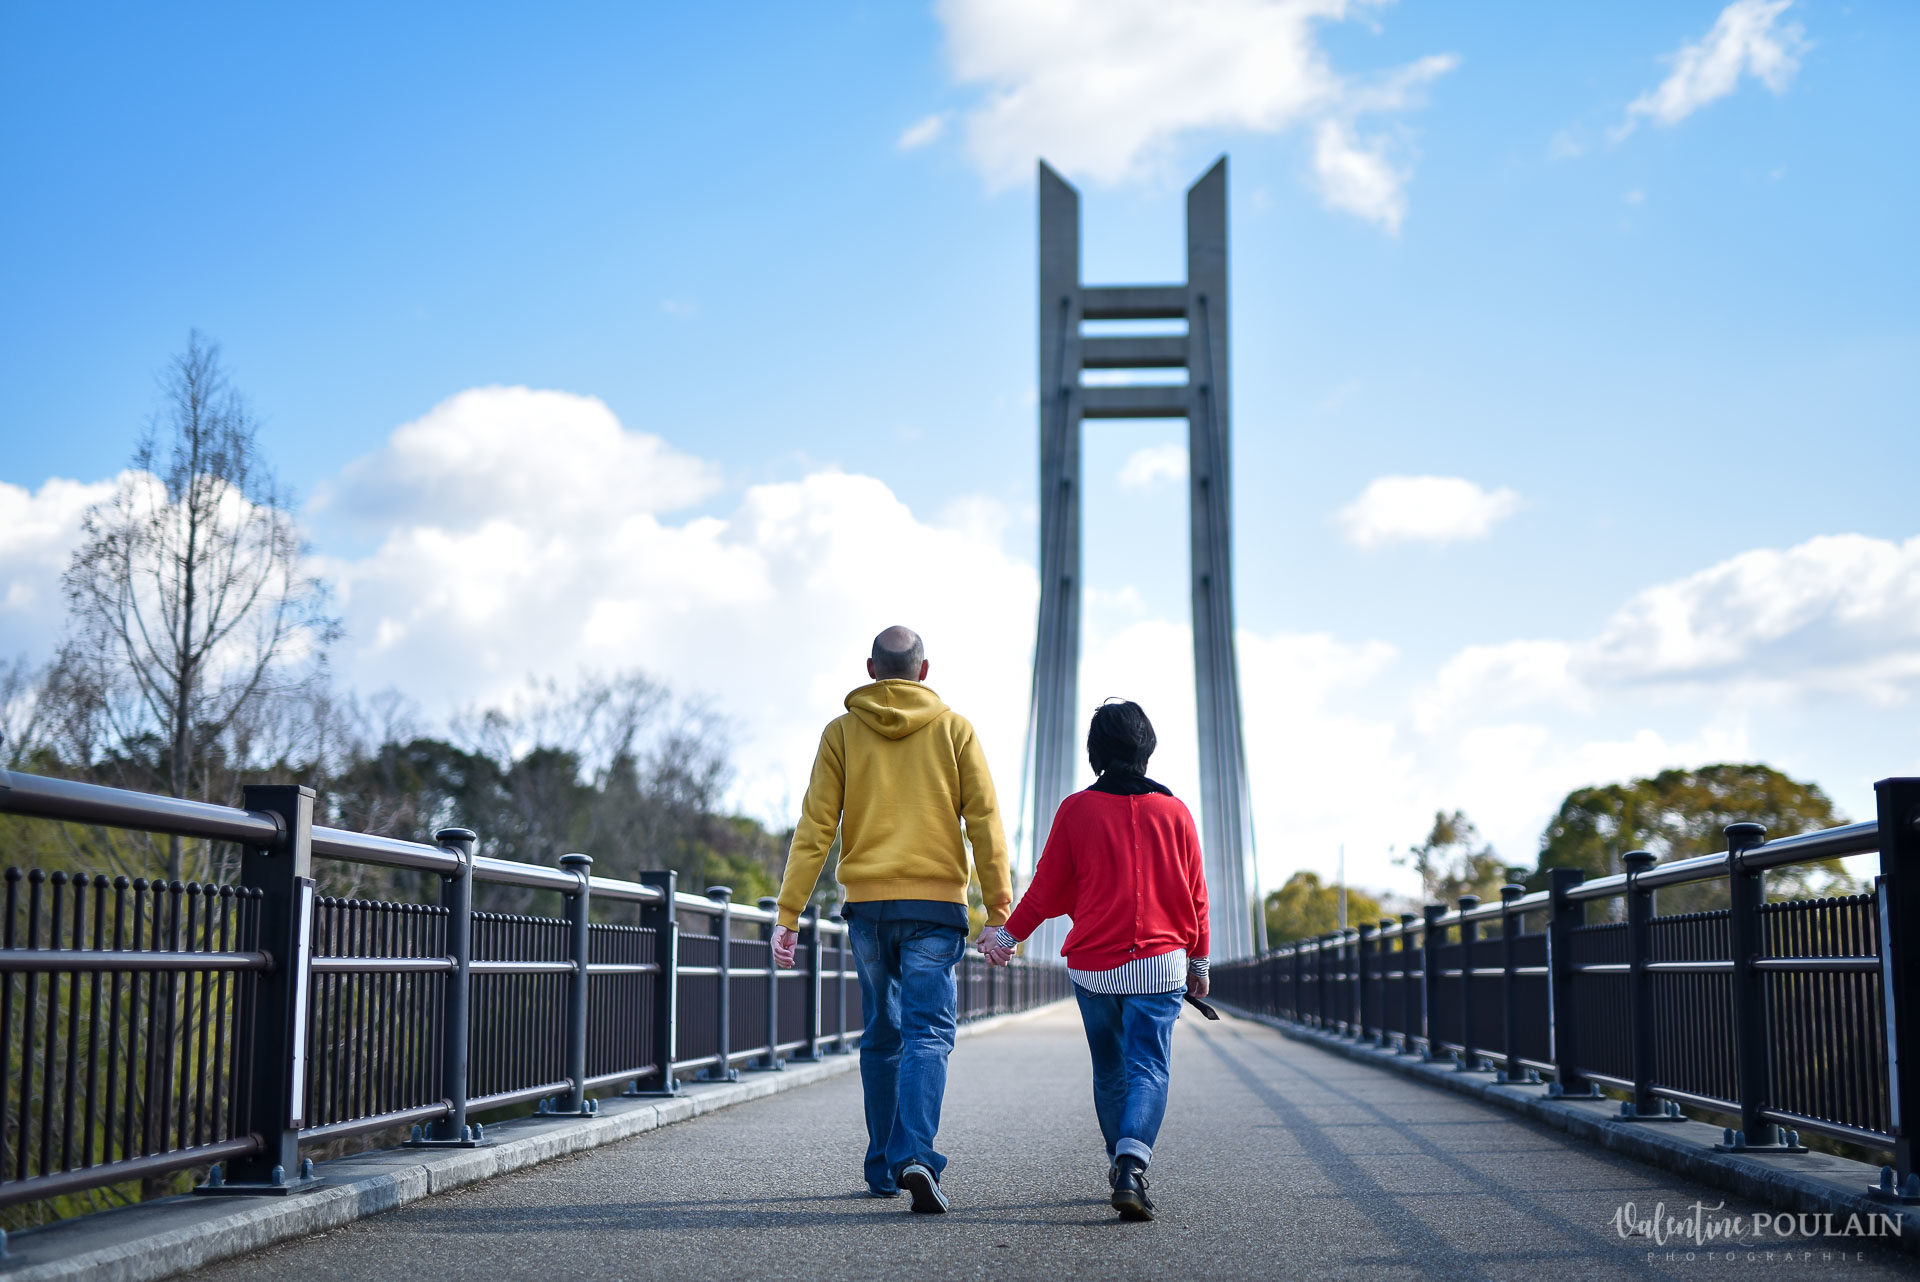 Shooting Couple Kyoto - Valentine Poulain pont